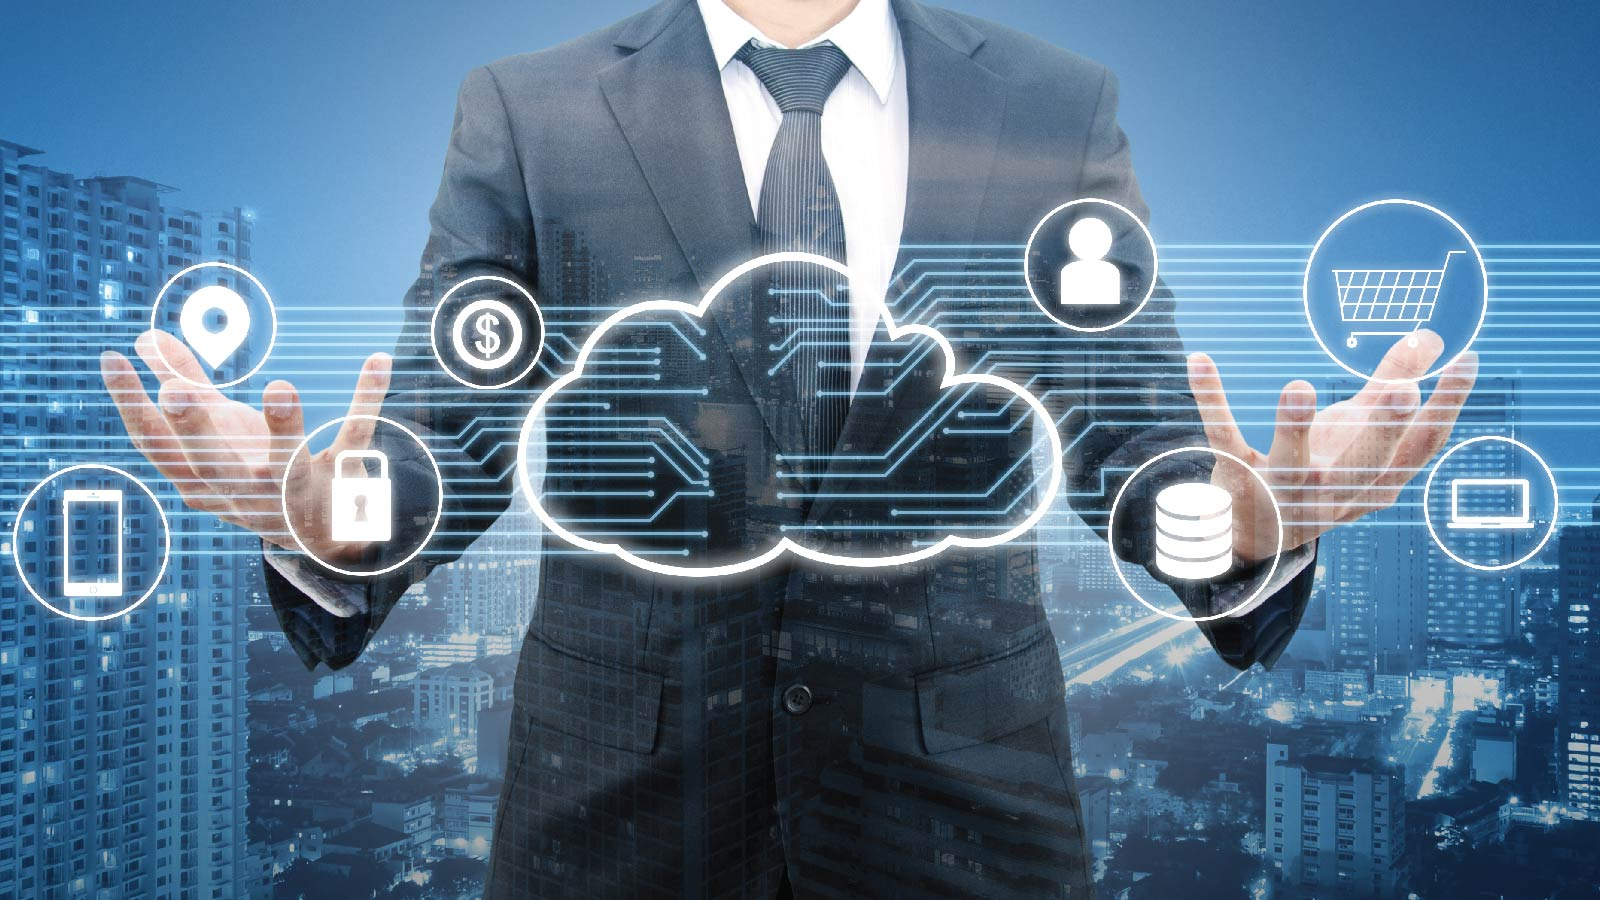 Essentials to Build a Digital-ready Enterprise Culture